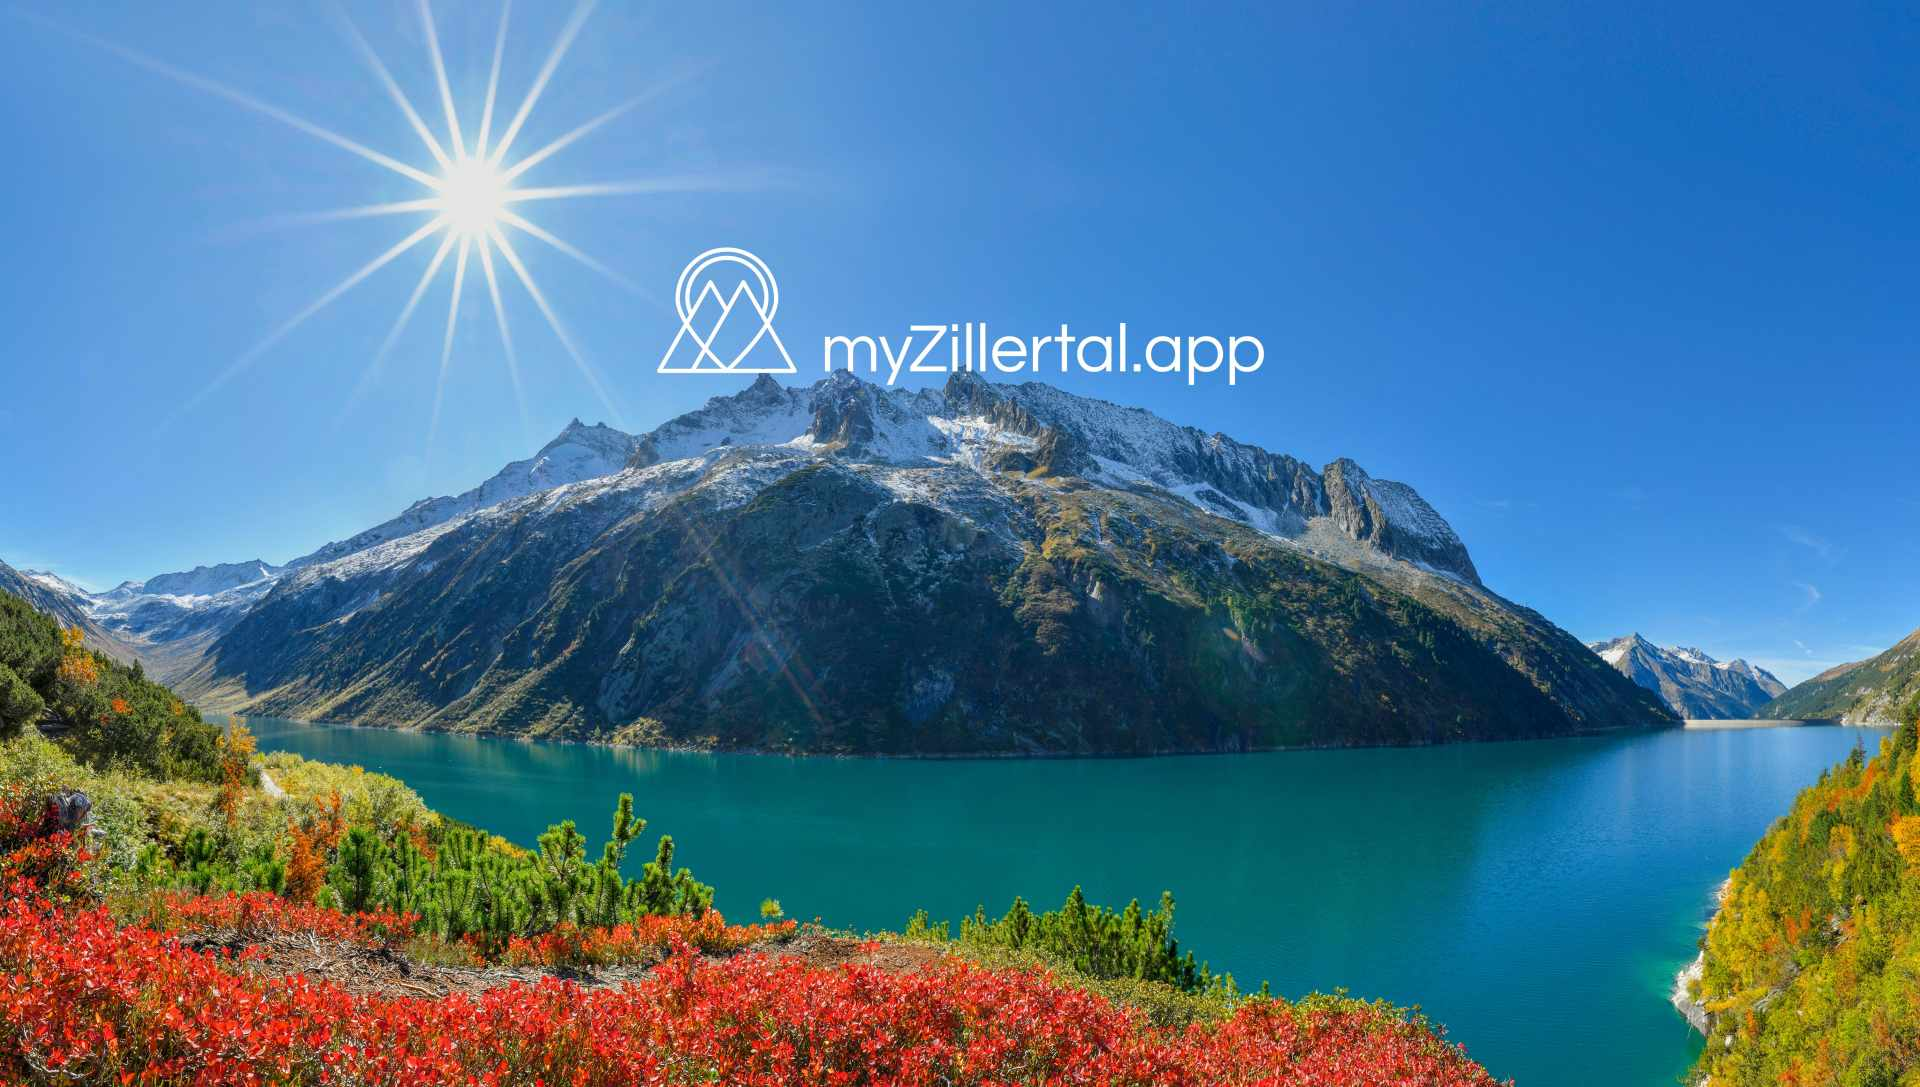 MyZillertal.app free download